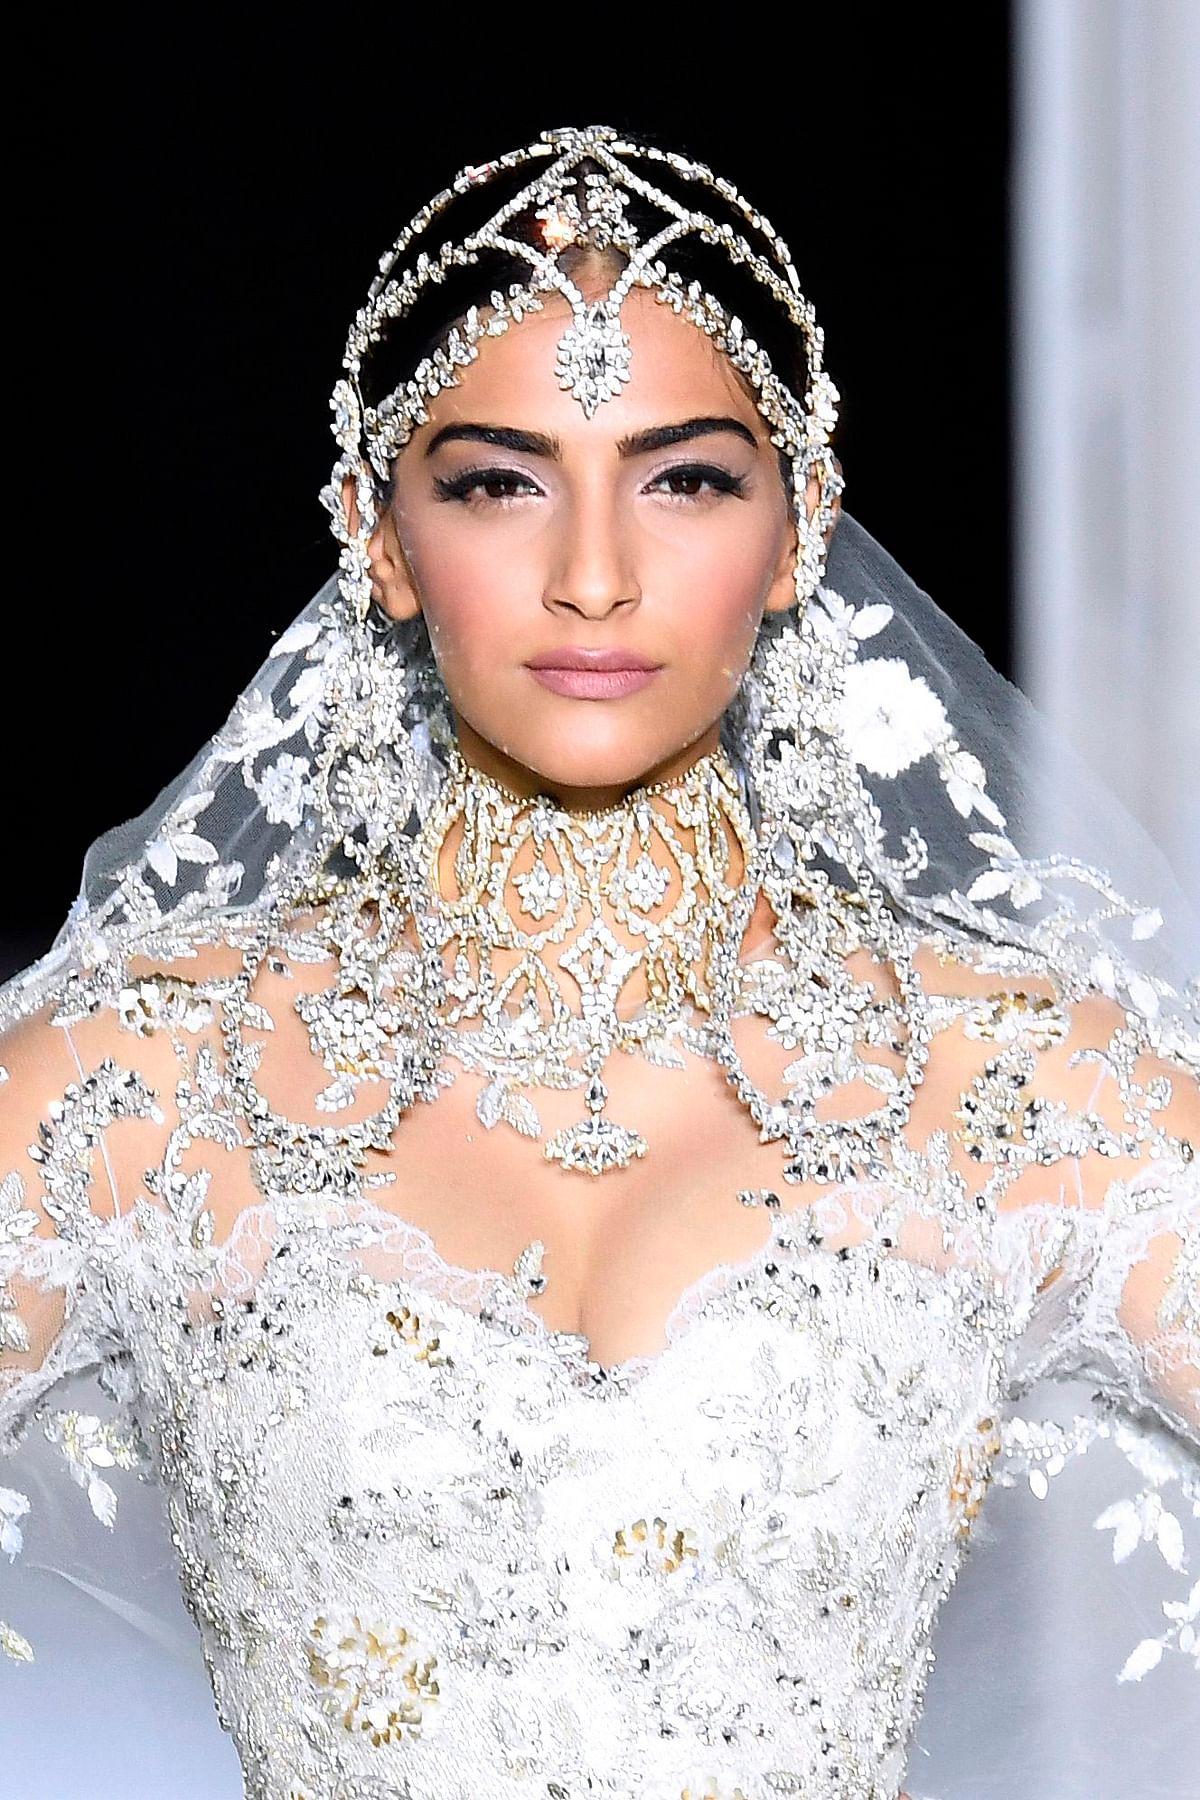 Paris Fashion Week 2017 Pictures: Fashionista Sonam Kapoor stuns in bridal white gown